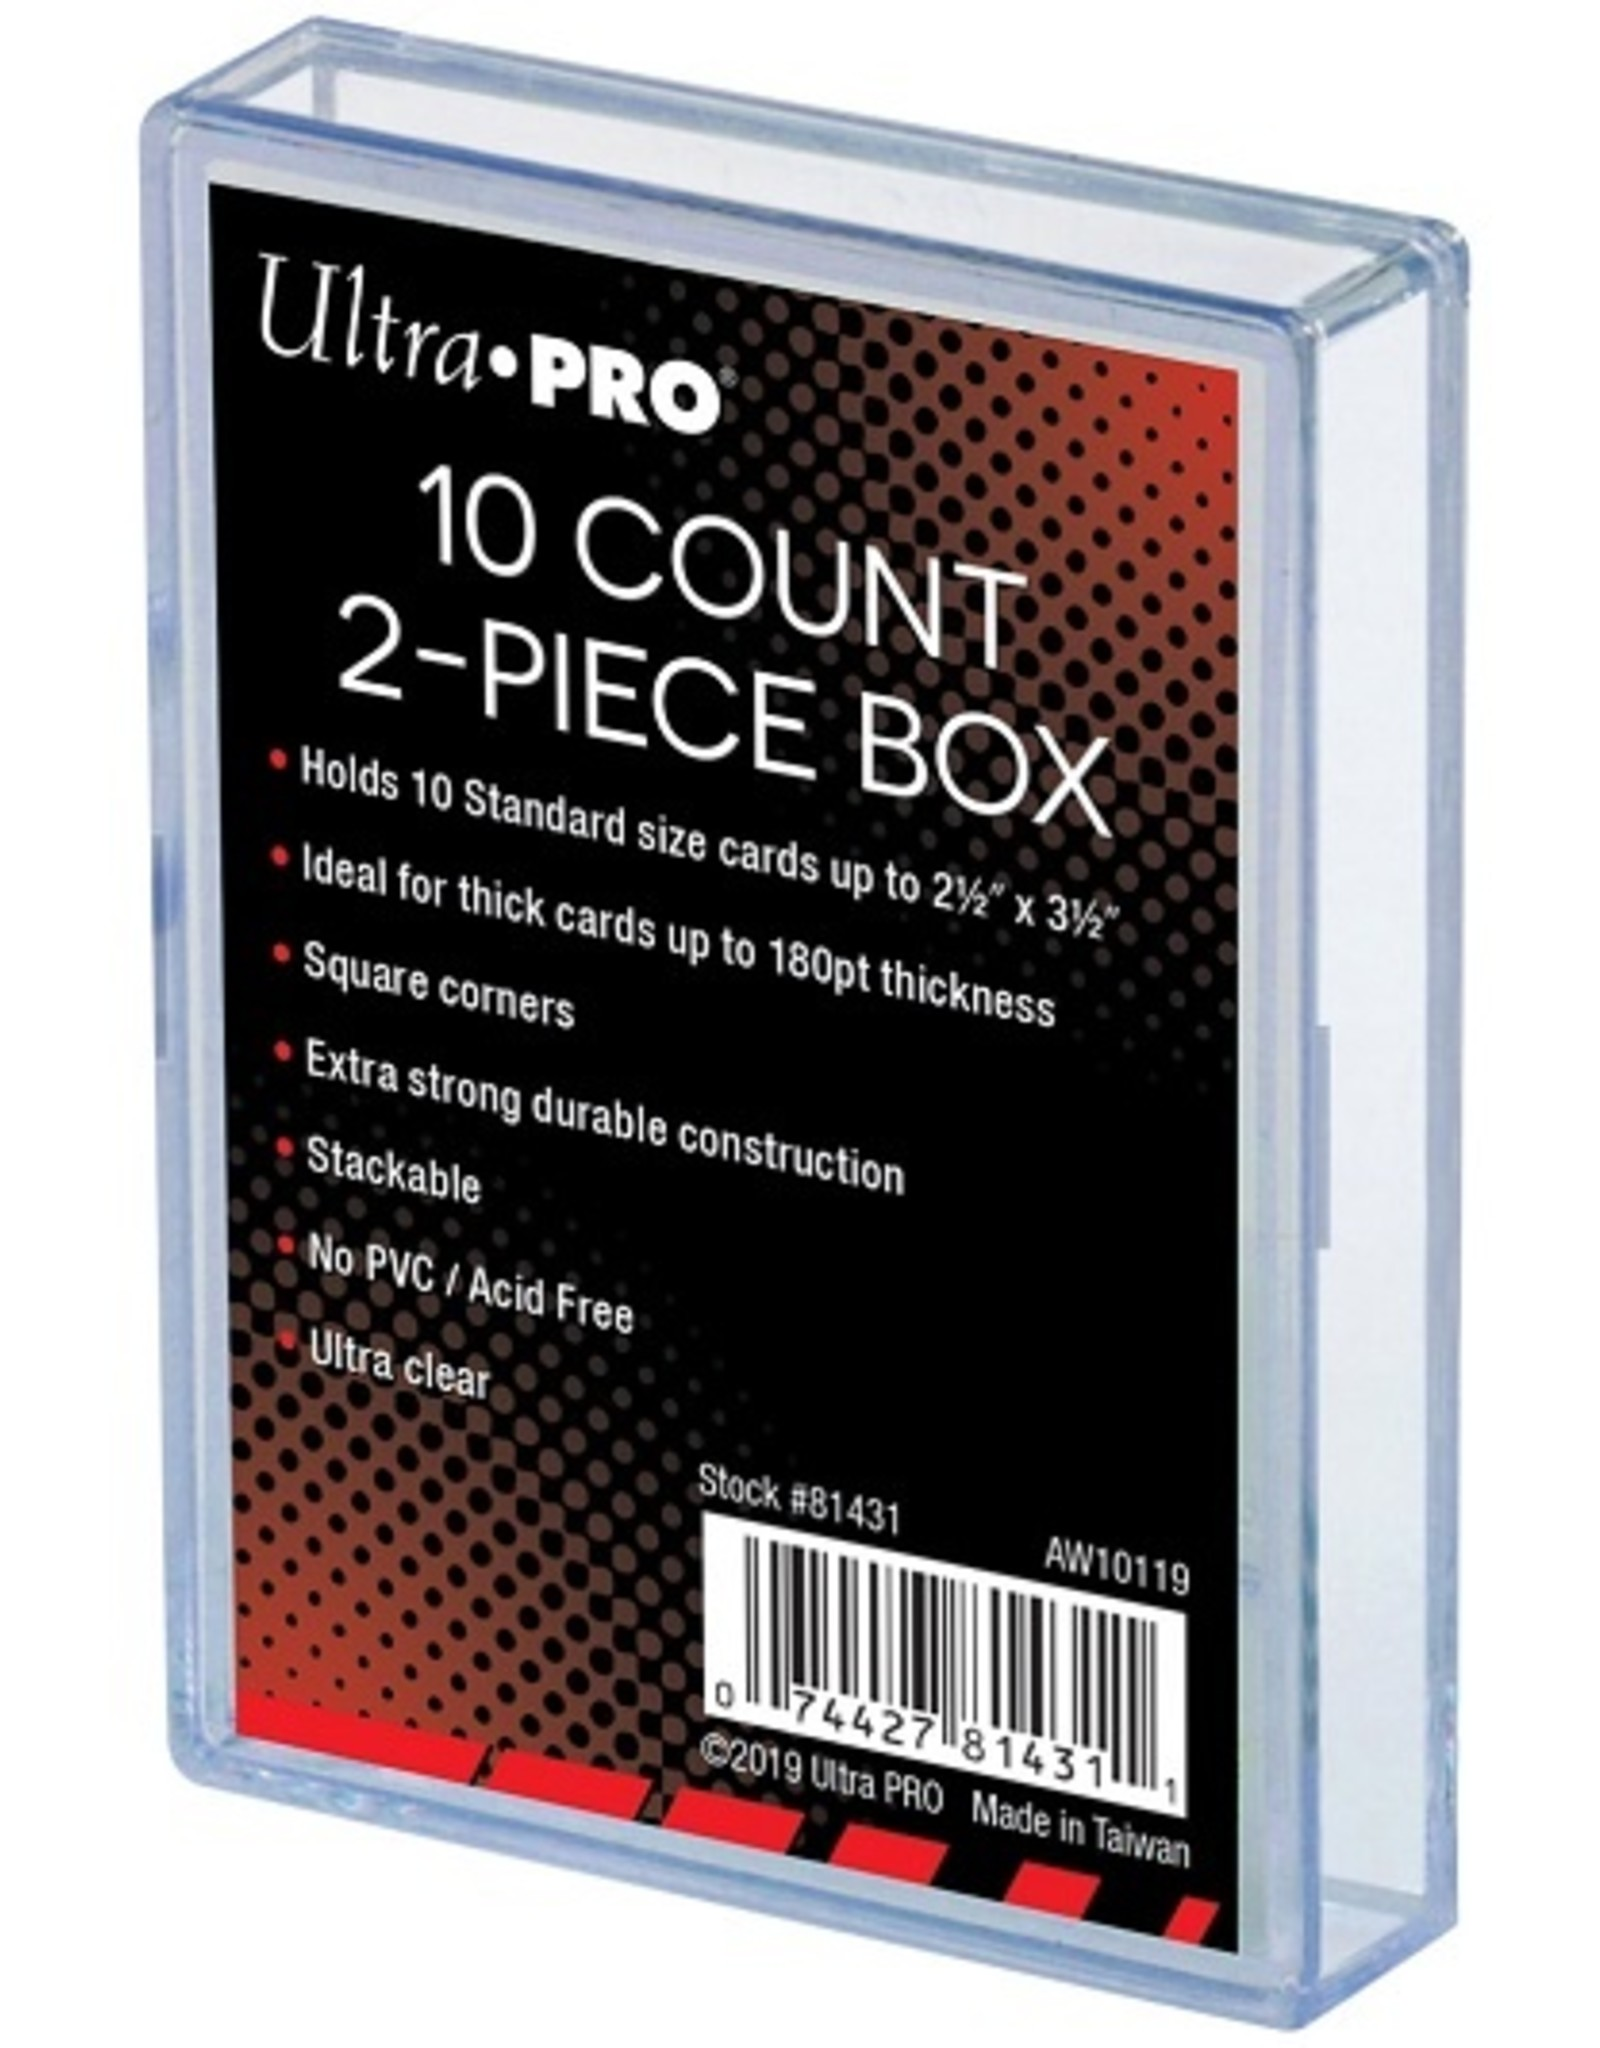 Ultra Pro Ultra Pro 2-Piece Storage Cases